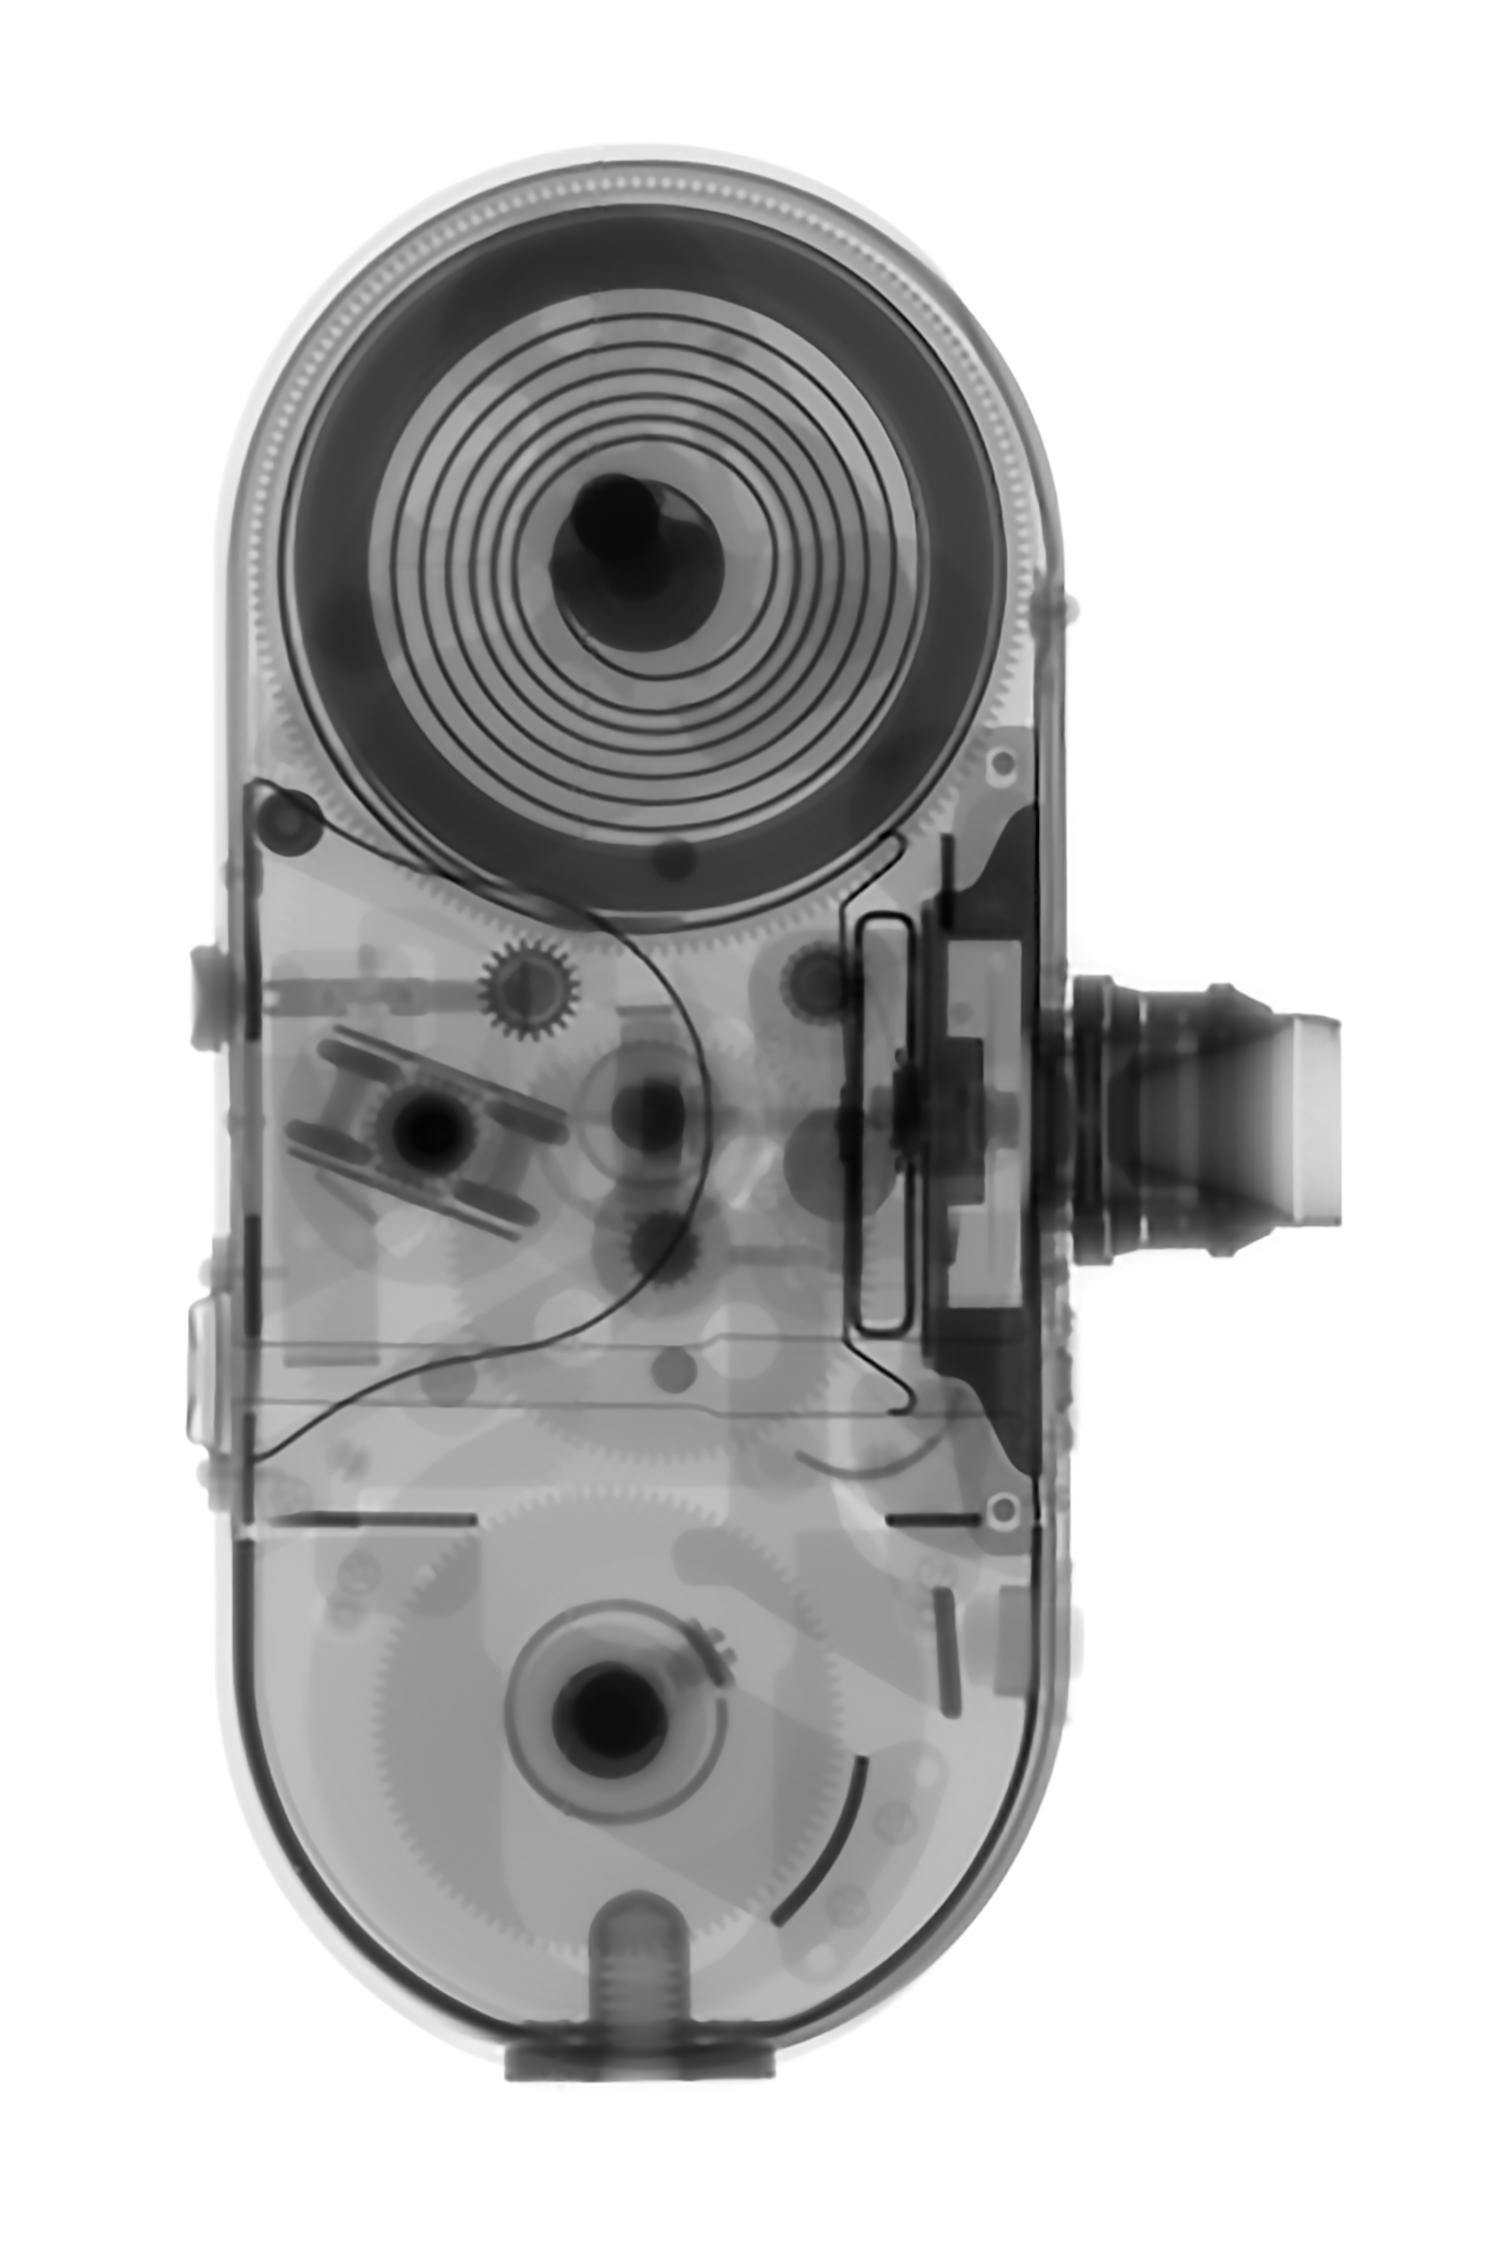 """Keystone K-8"" by Kent Krugh, 13x19in, x-ray archival pigment print (2016), $400 | BUY NOW"